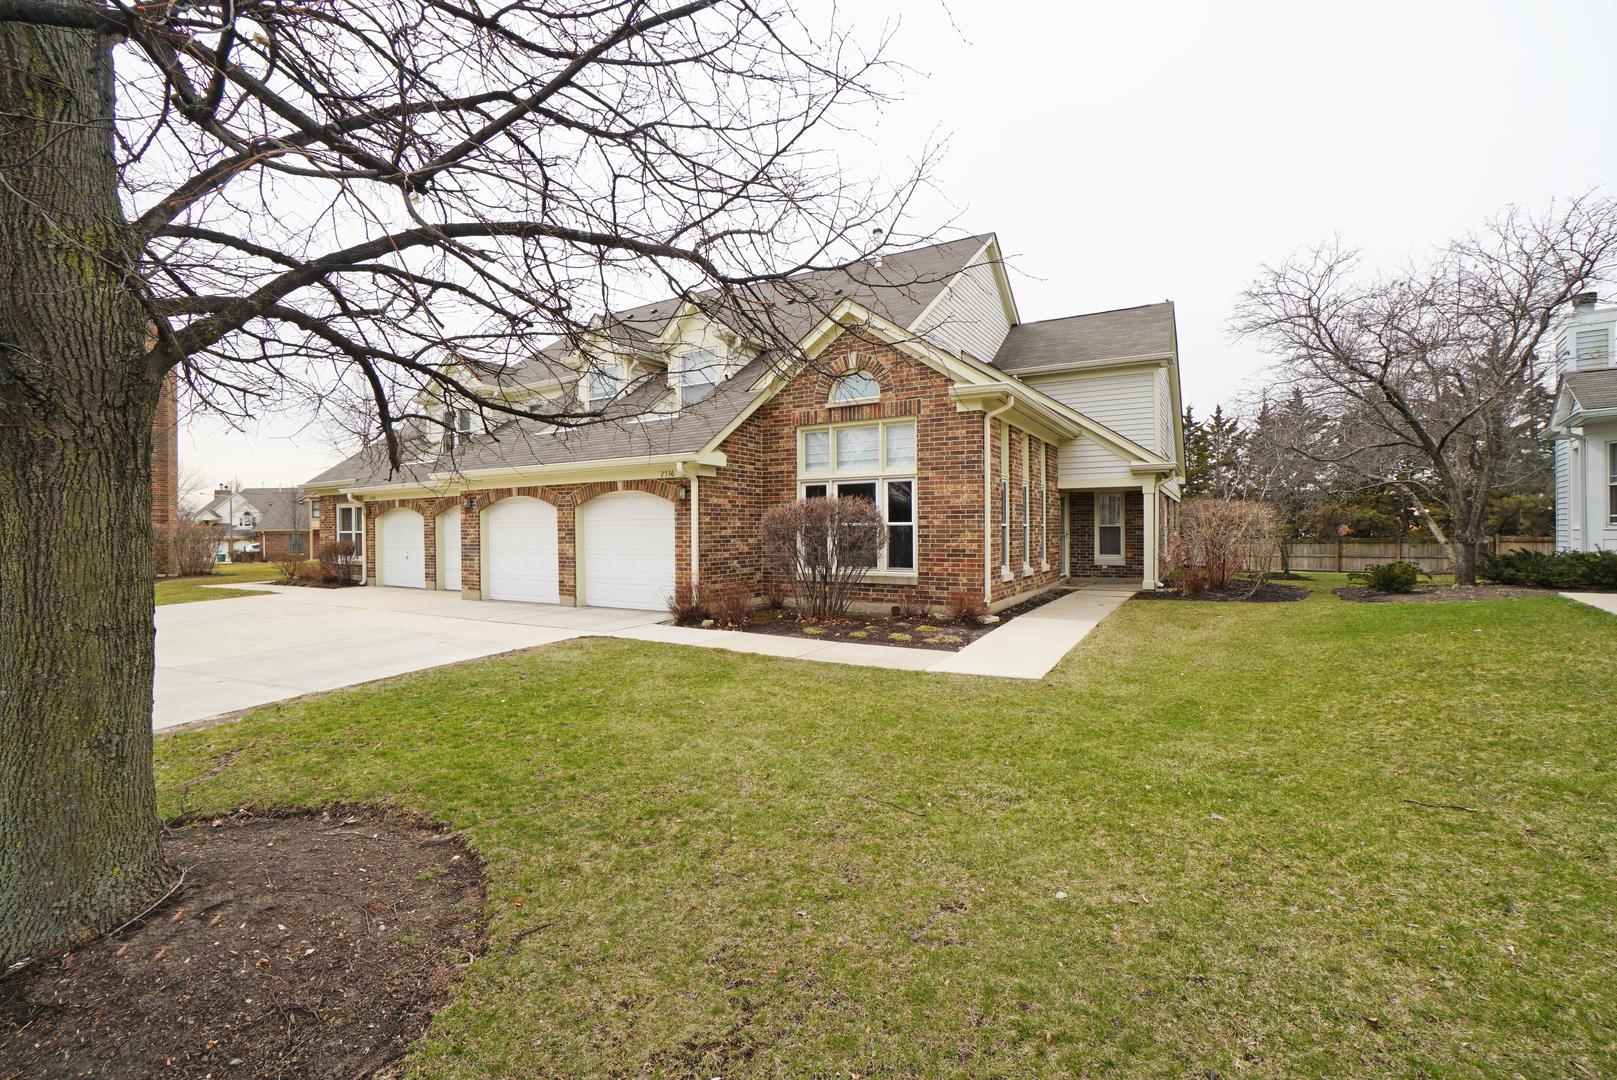 2536 LIVE OAK Lane, Buffalo Grove in Lake County, IL 60089 Home for Sale